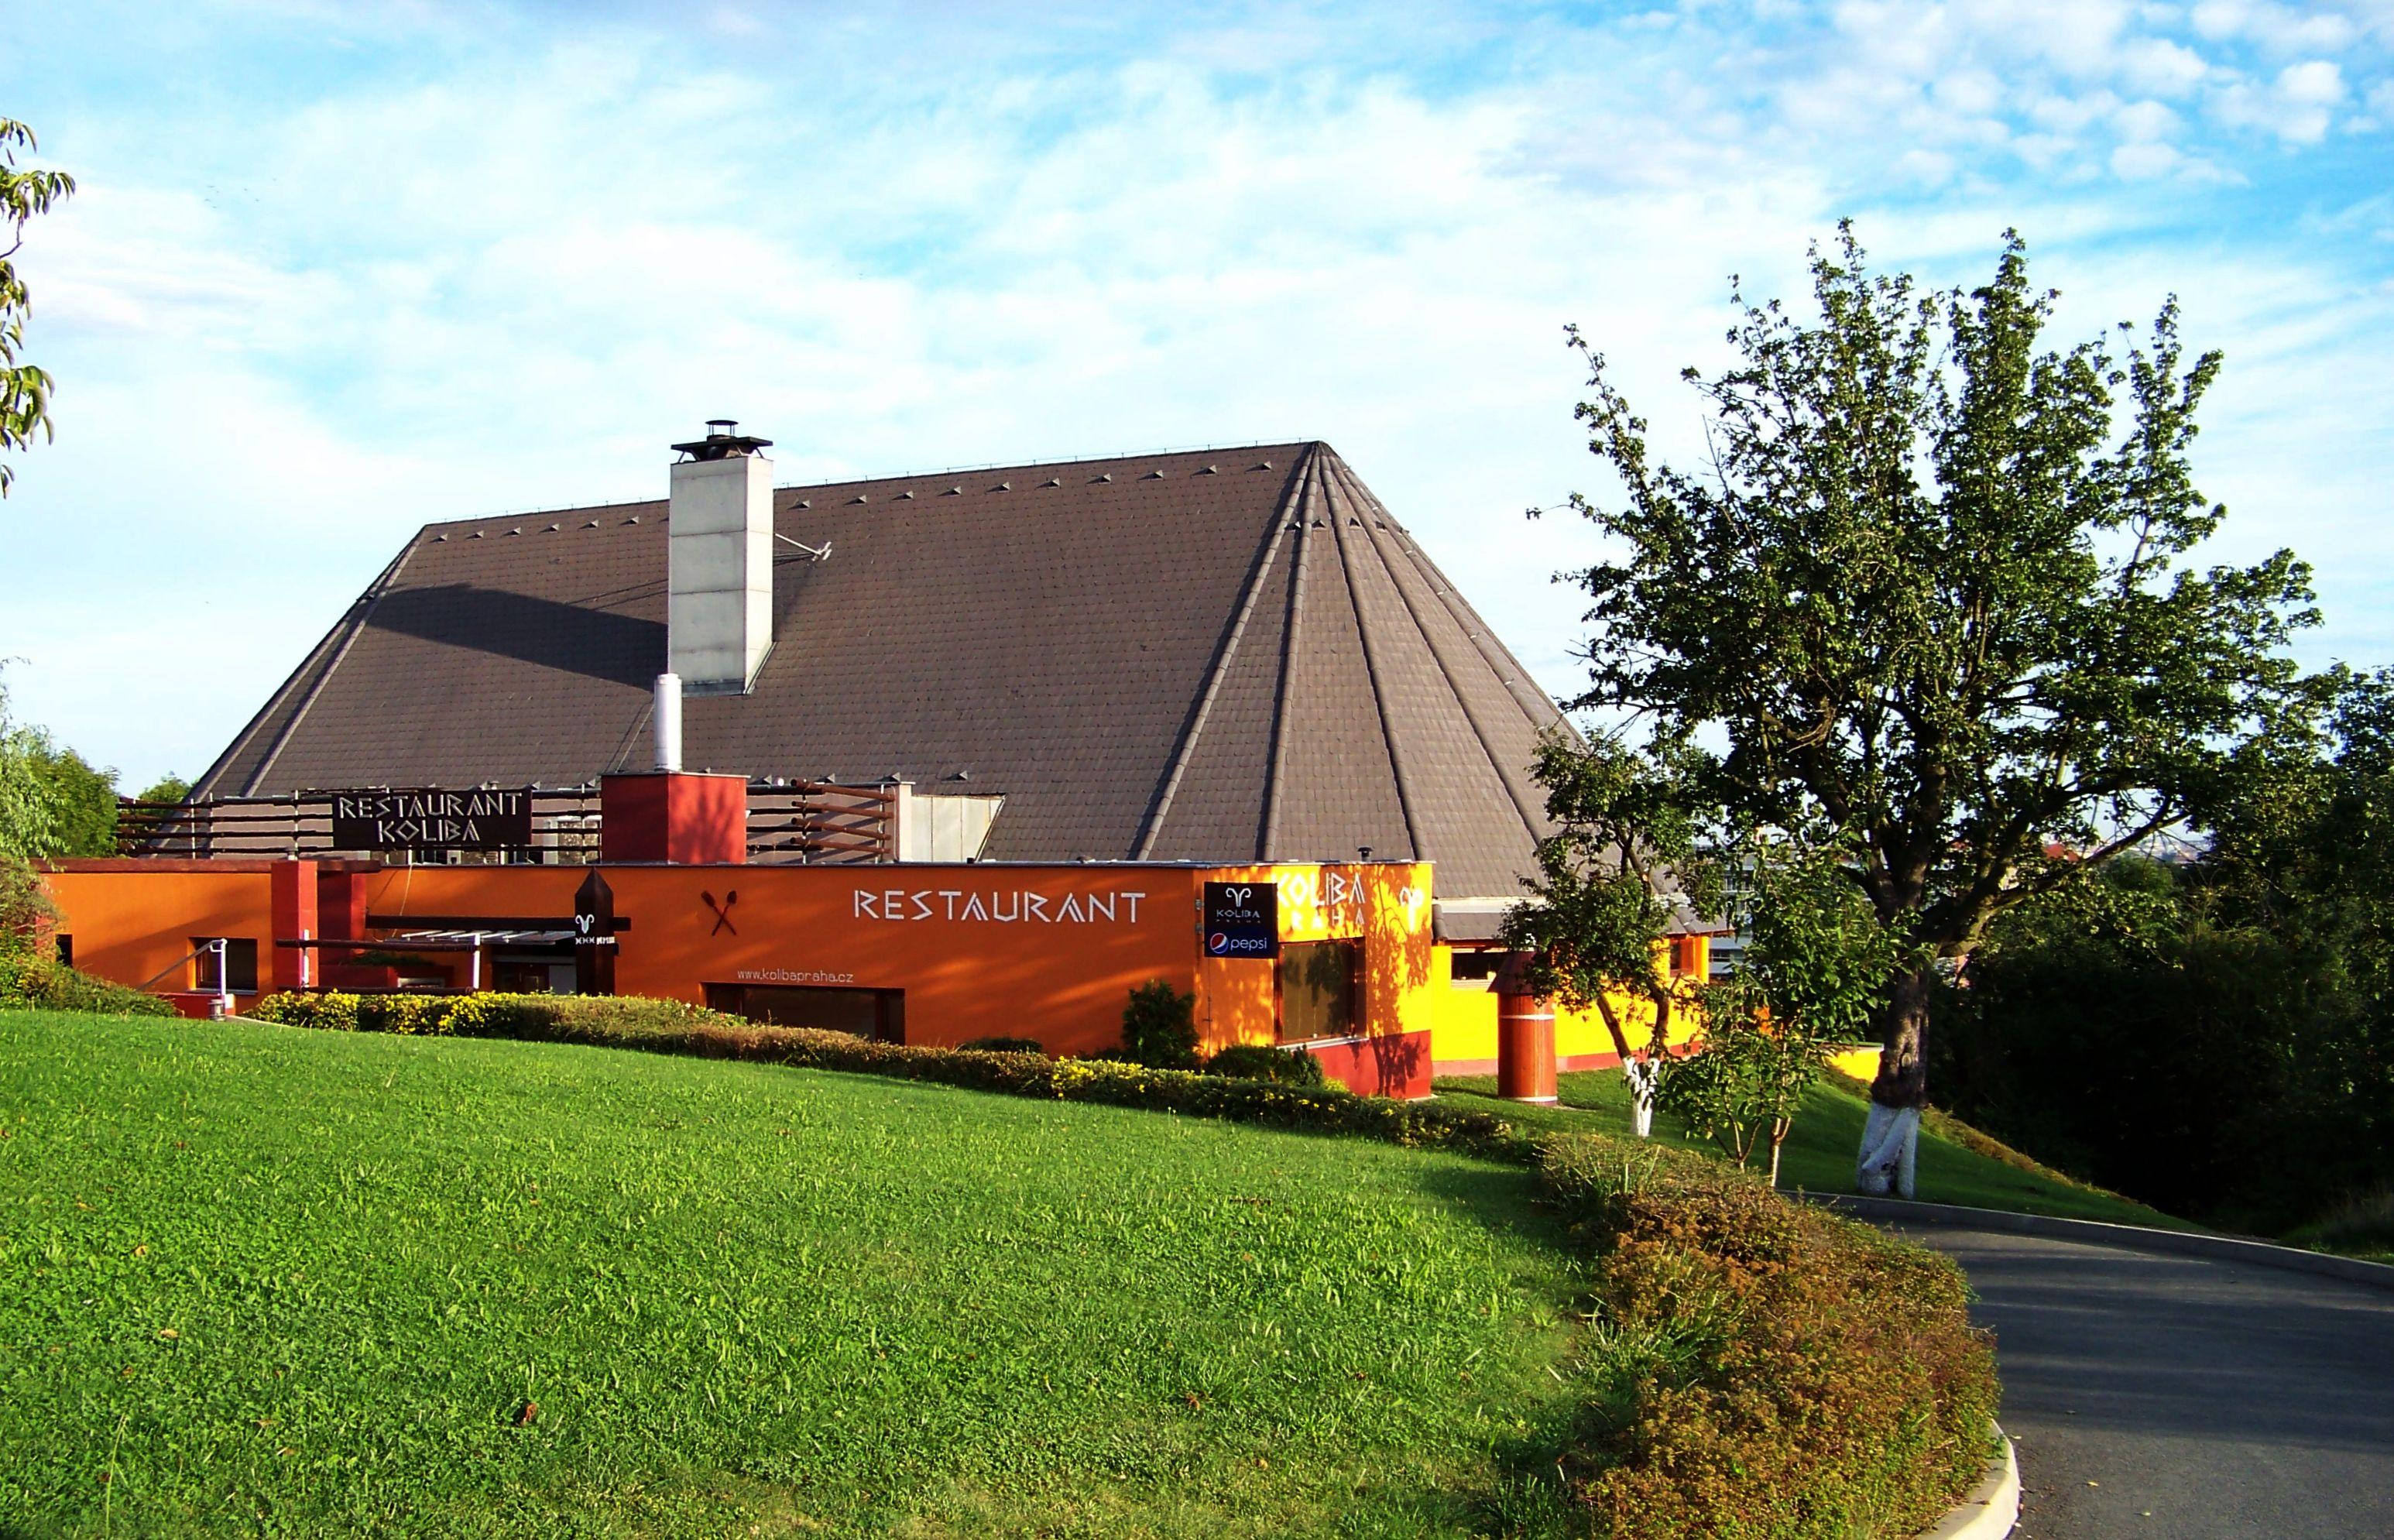 File:Horní Roztyly, restaurant Koliba (01) jpg - Wikimedia